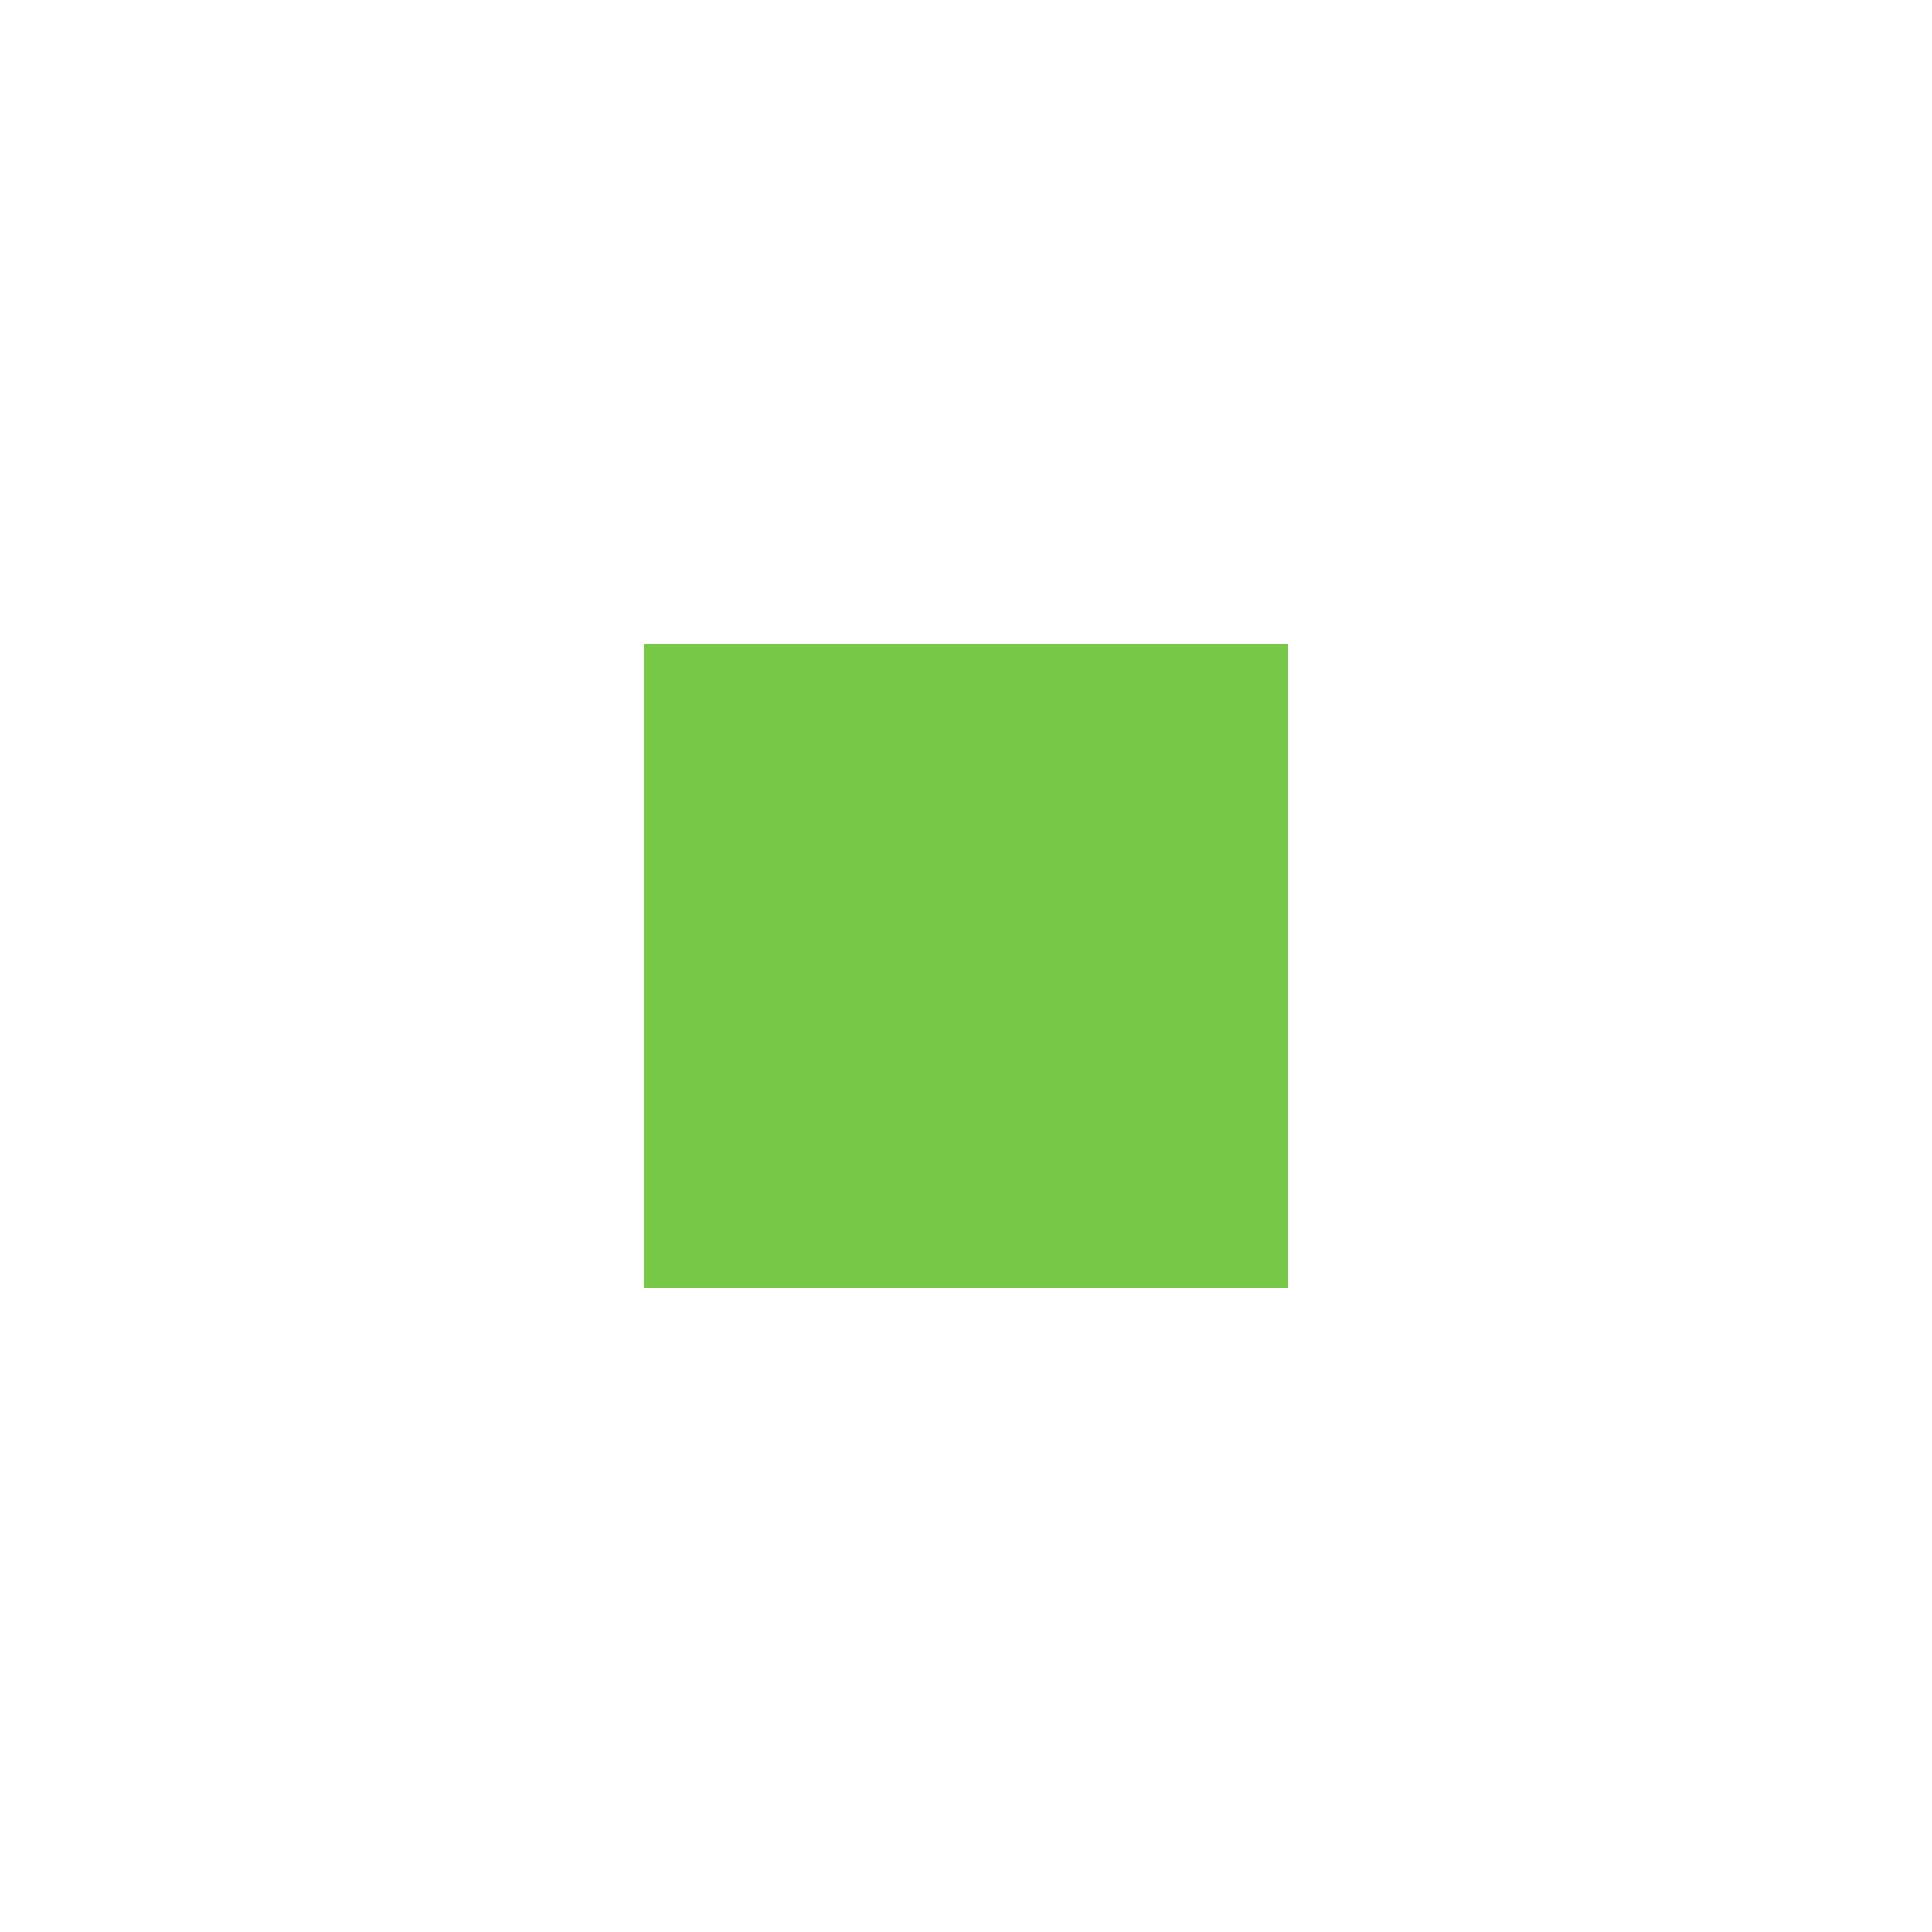 چراغ سبز Honeywell PC42t